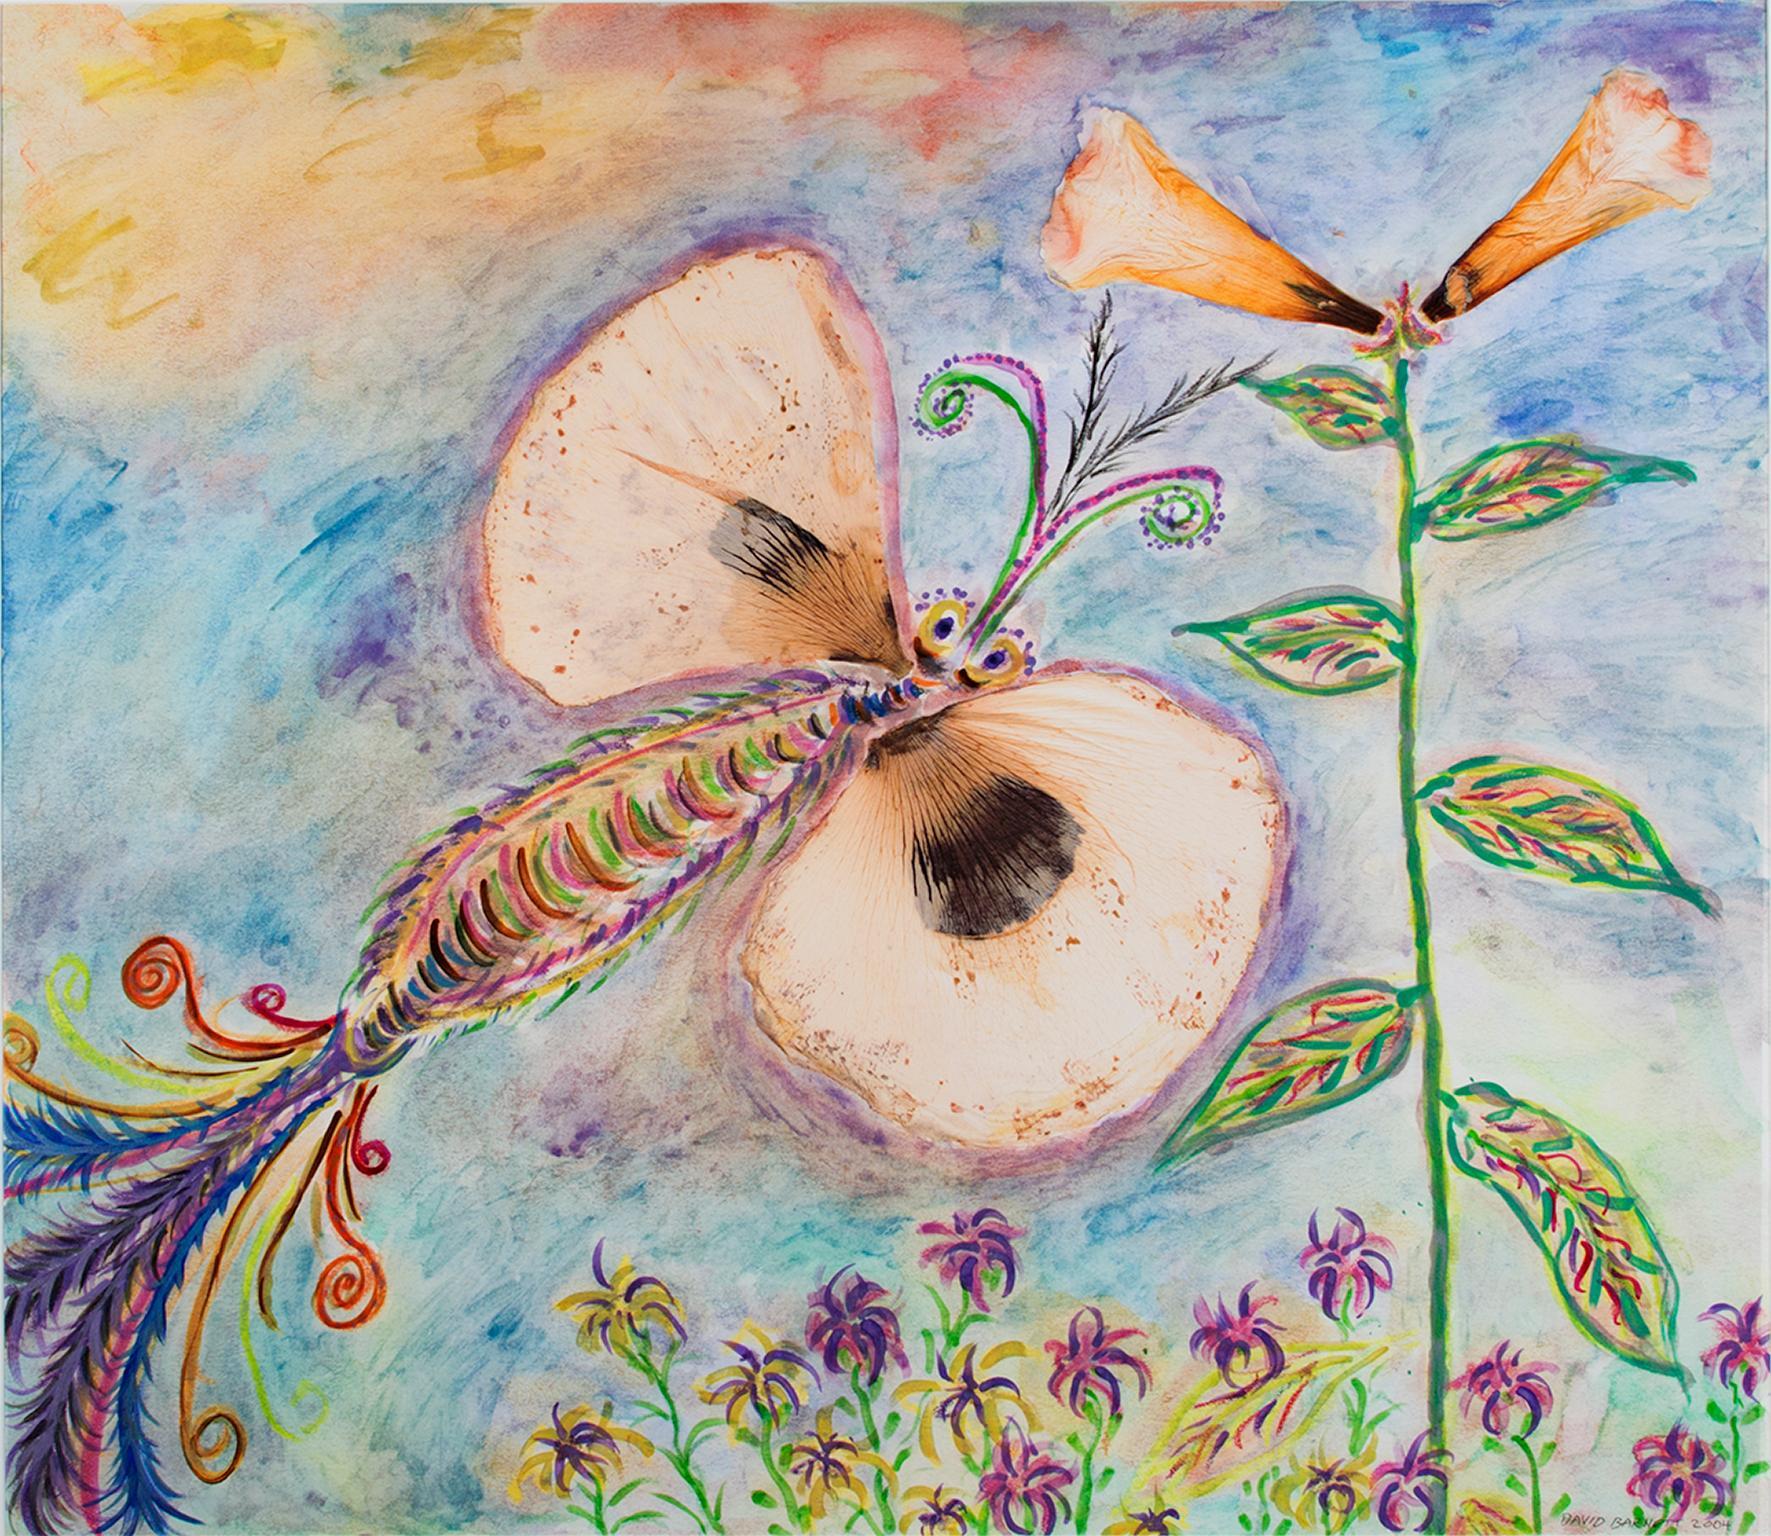 """Poppy Winged Hybrid Butterfly and Giant Gold Lily,"" Mixed Media, David Barnett"